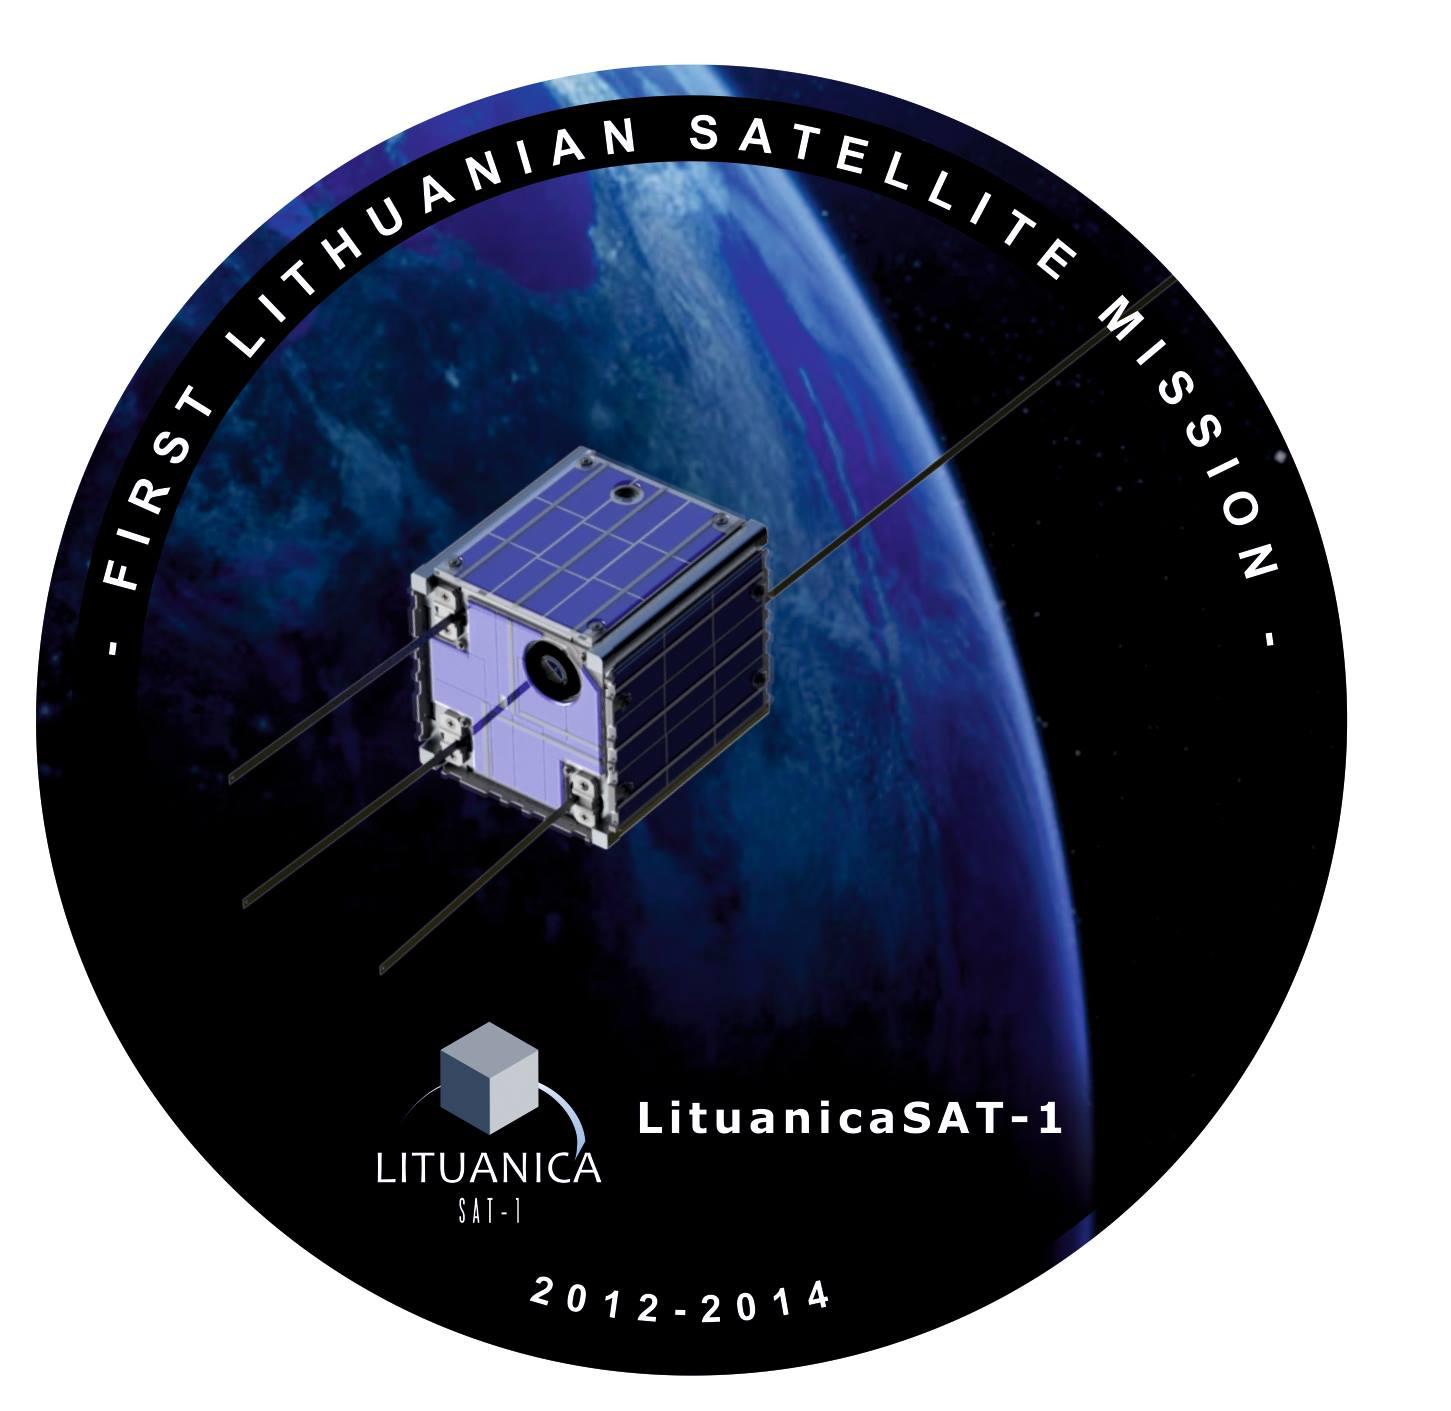 lituanicasat-1